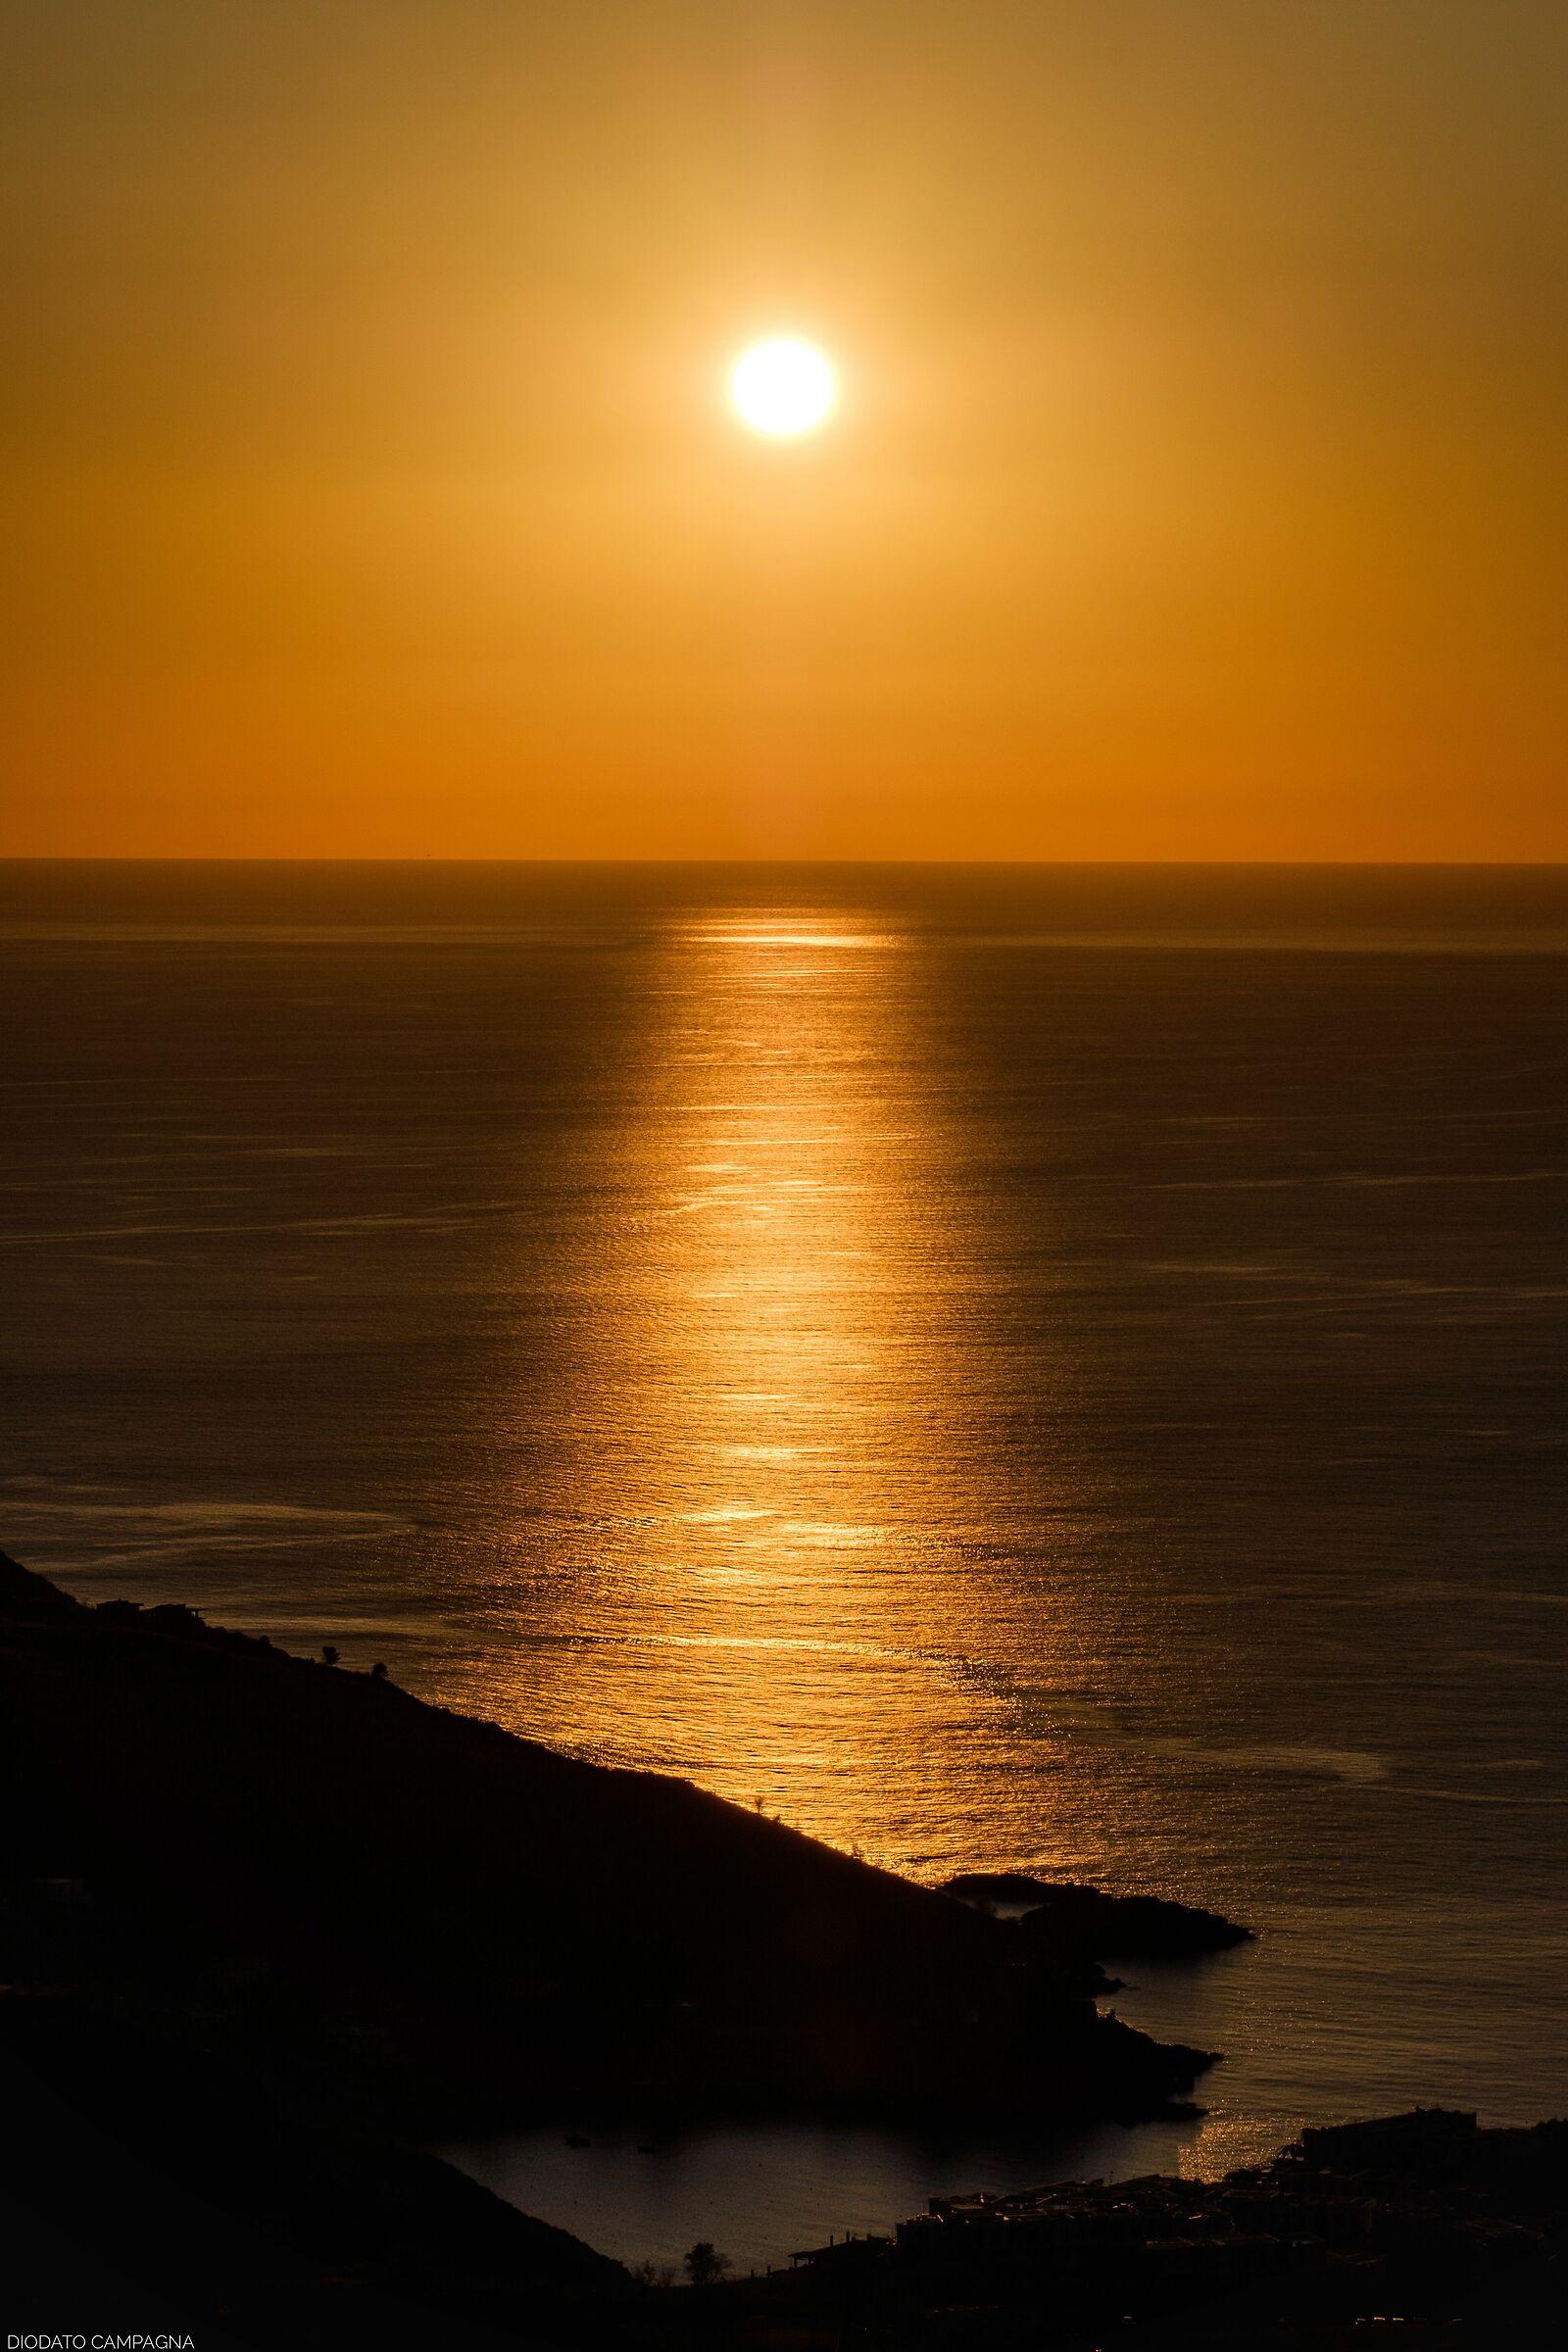 Sunset over the Tyrrhenian Sea...